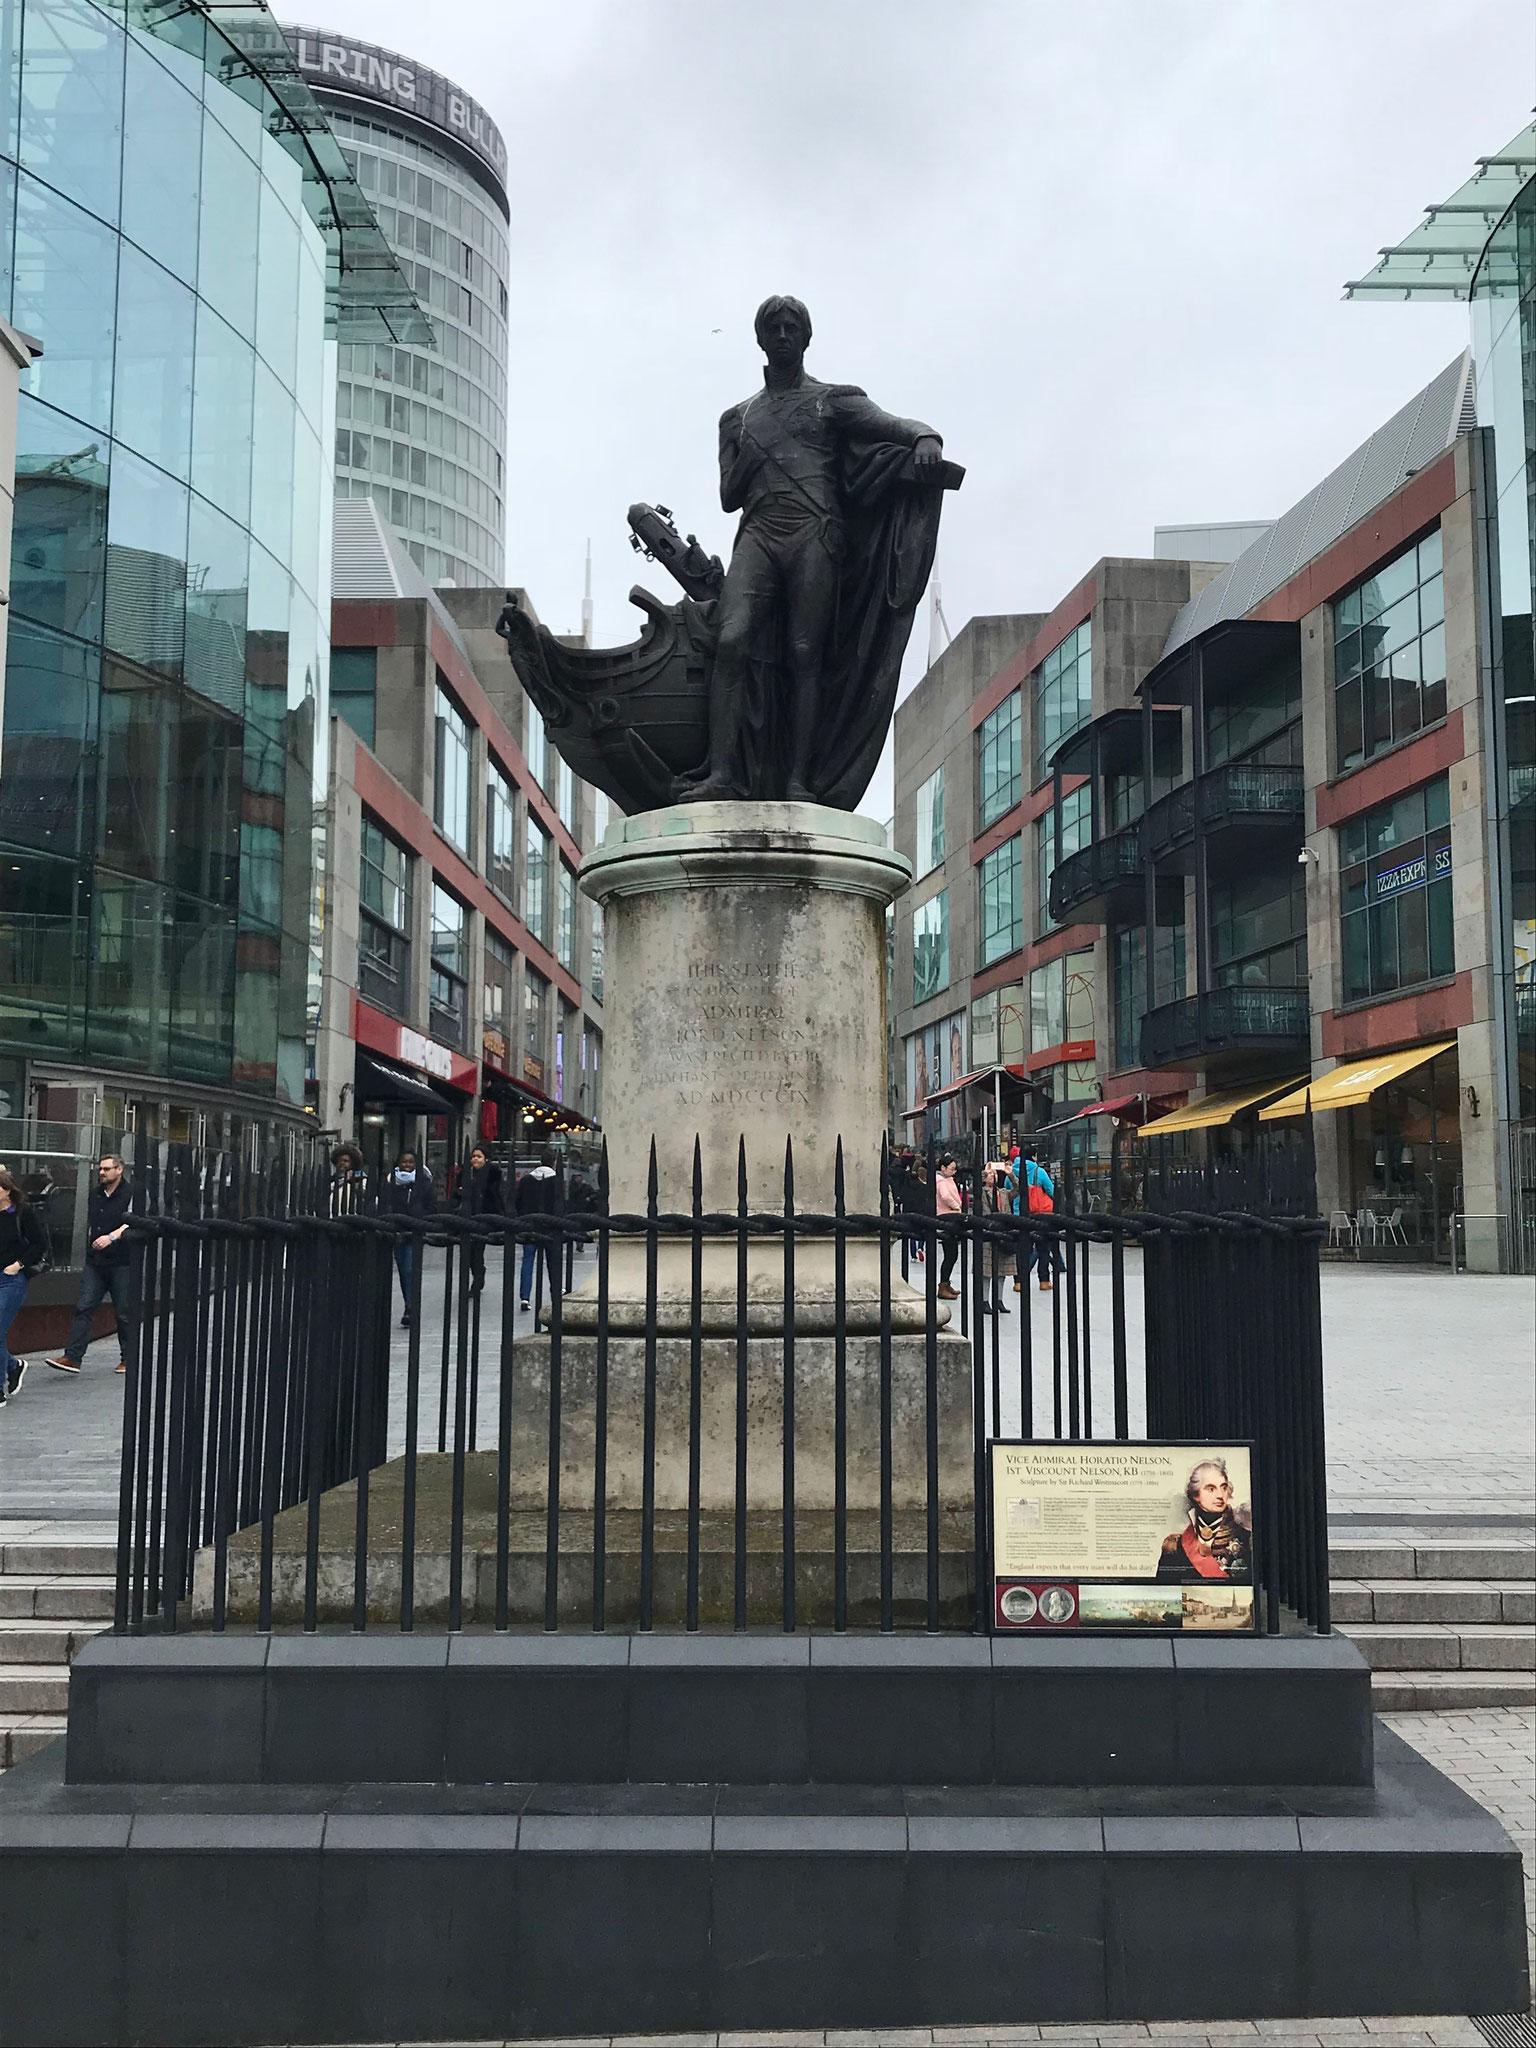 Lord Nelson-Denkmal am Bullring (Einkaufsstraße)